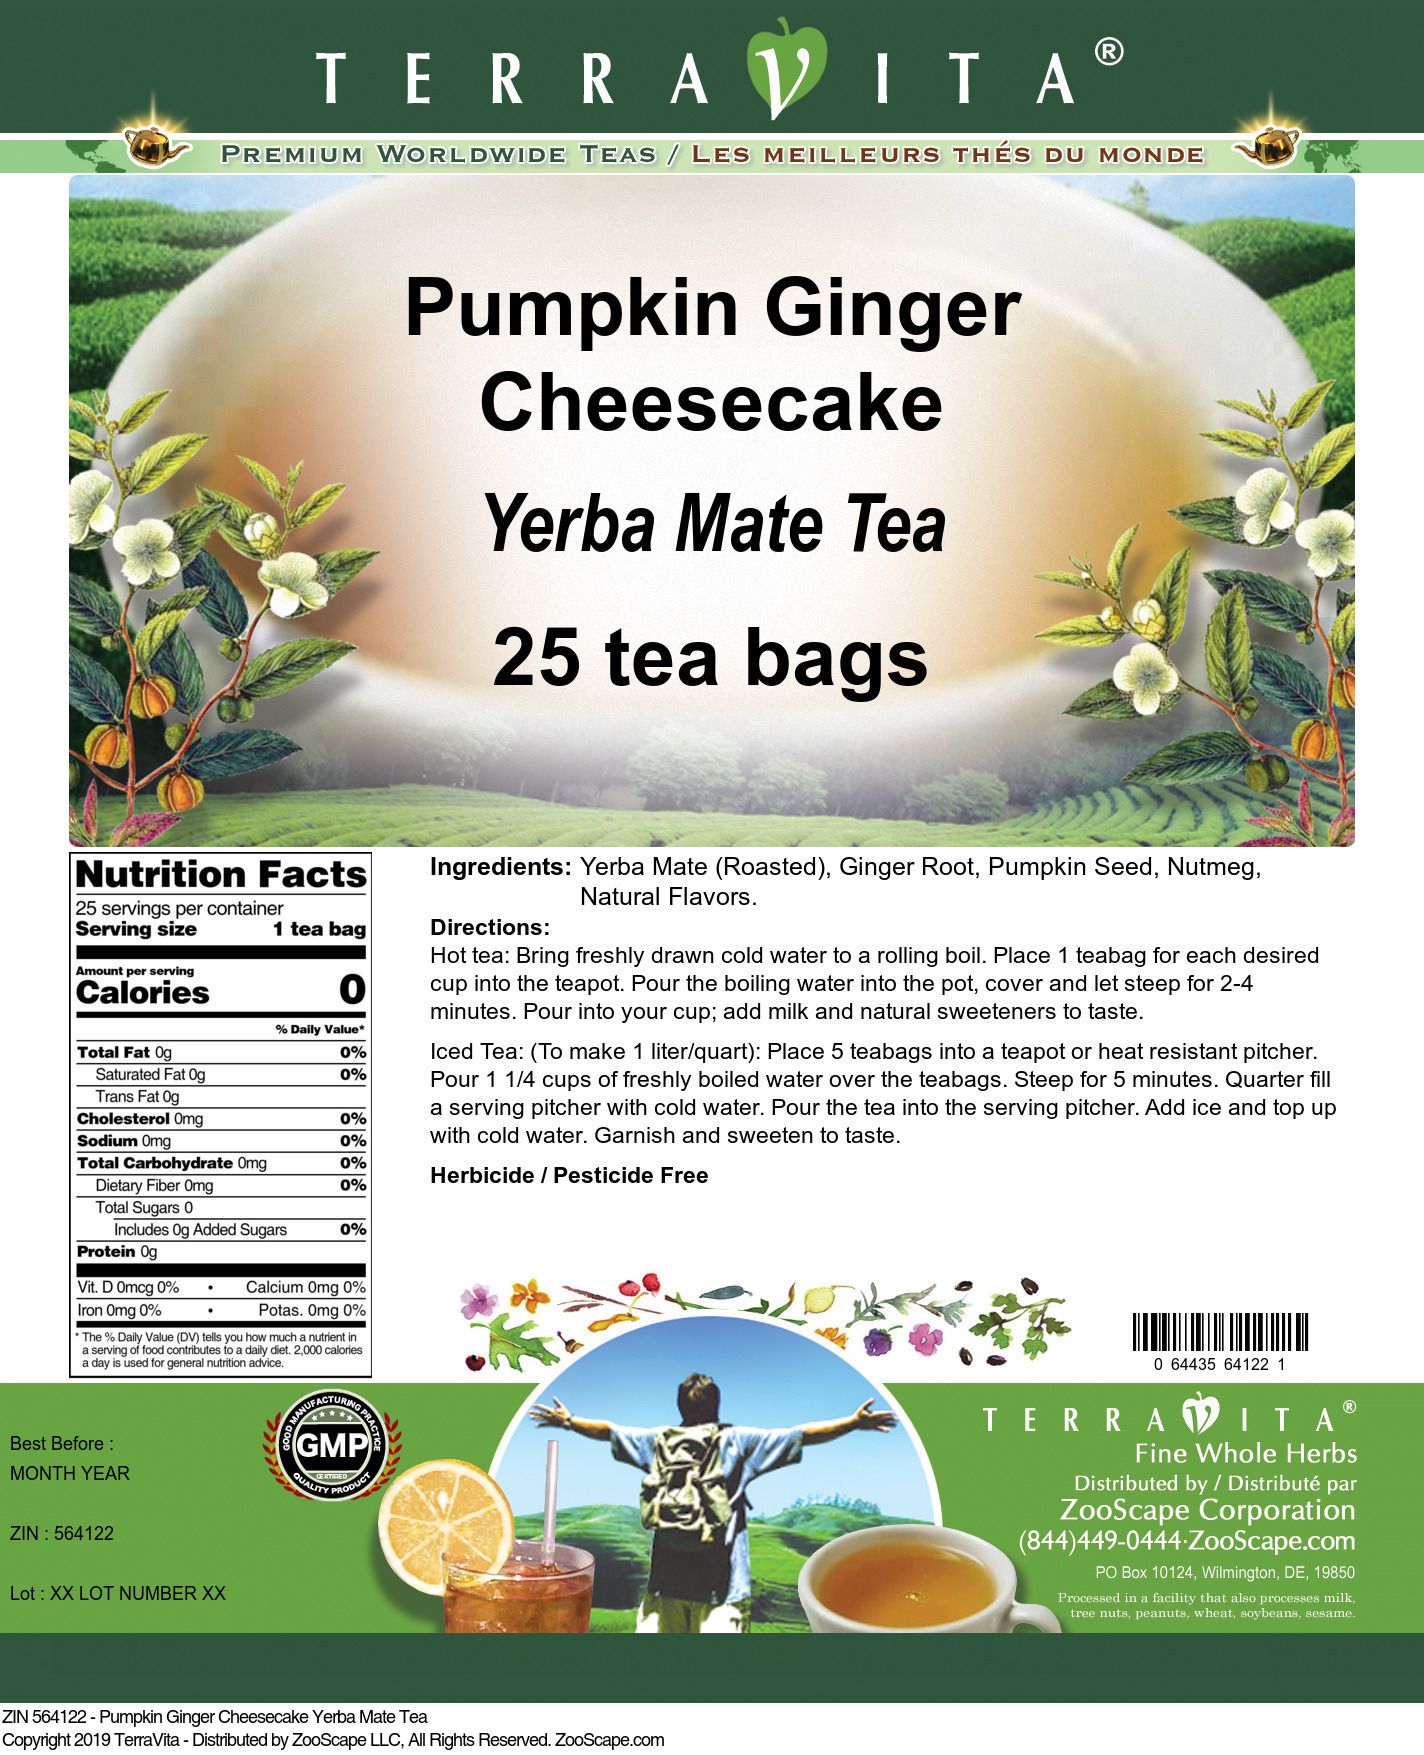 Pumpkin Ginger Cheesecake Yerba Mate Tea